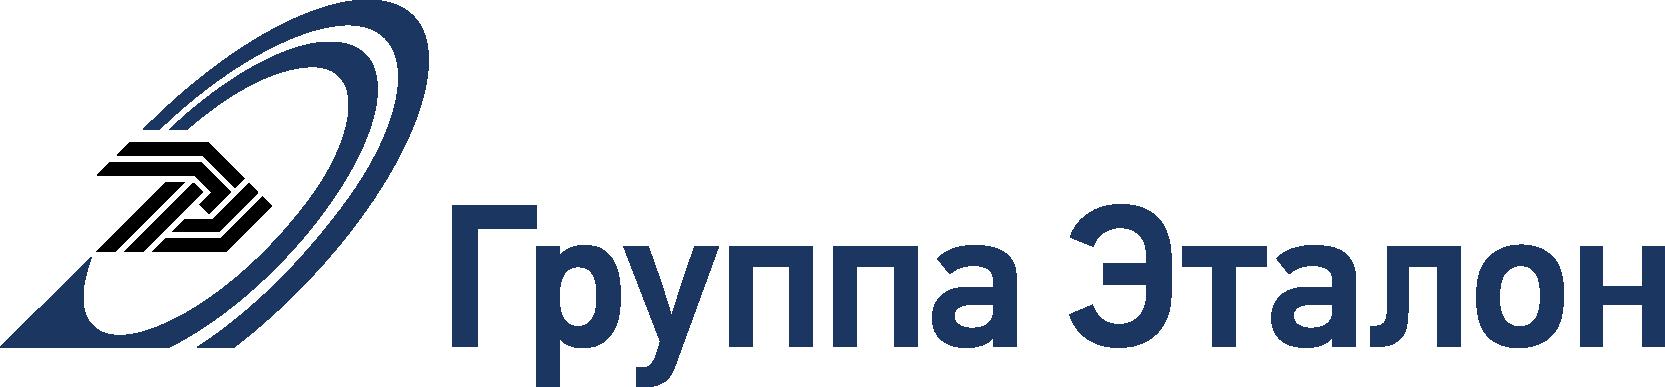 Etalon Group logo